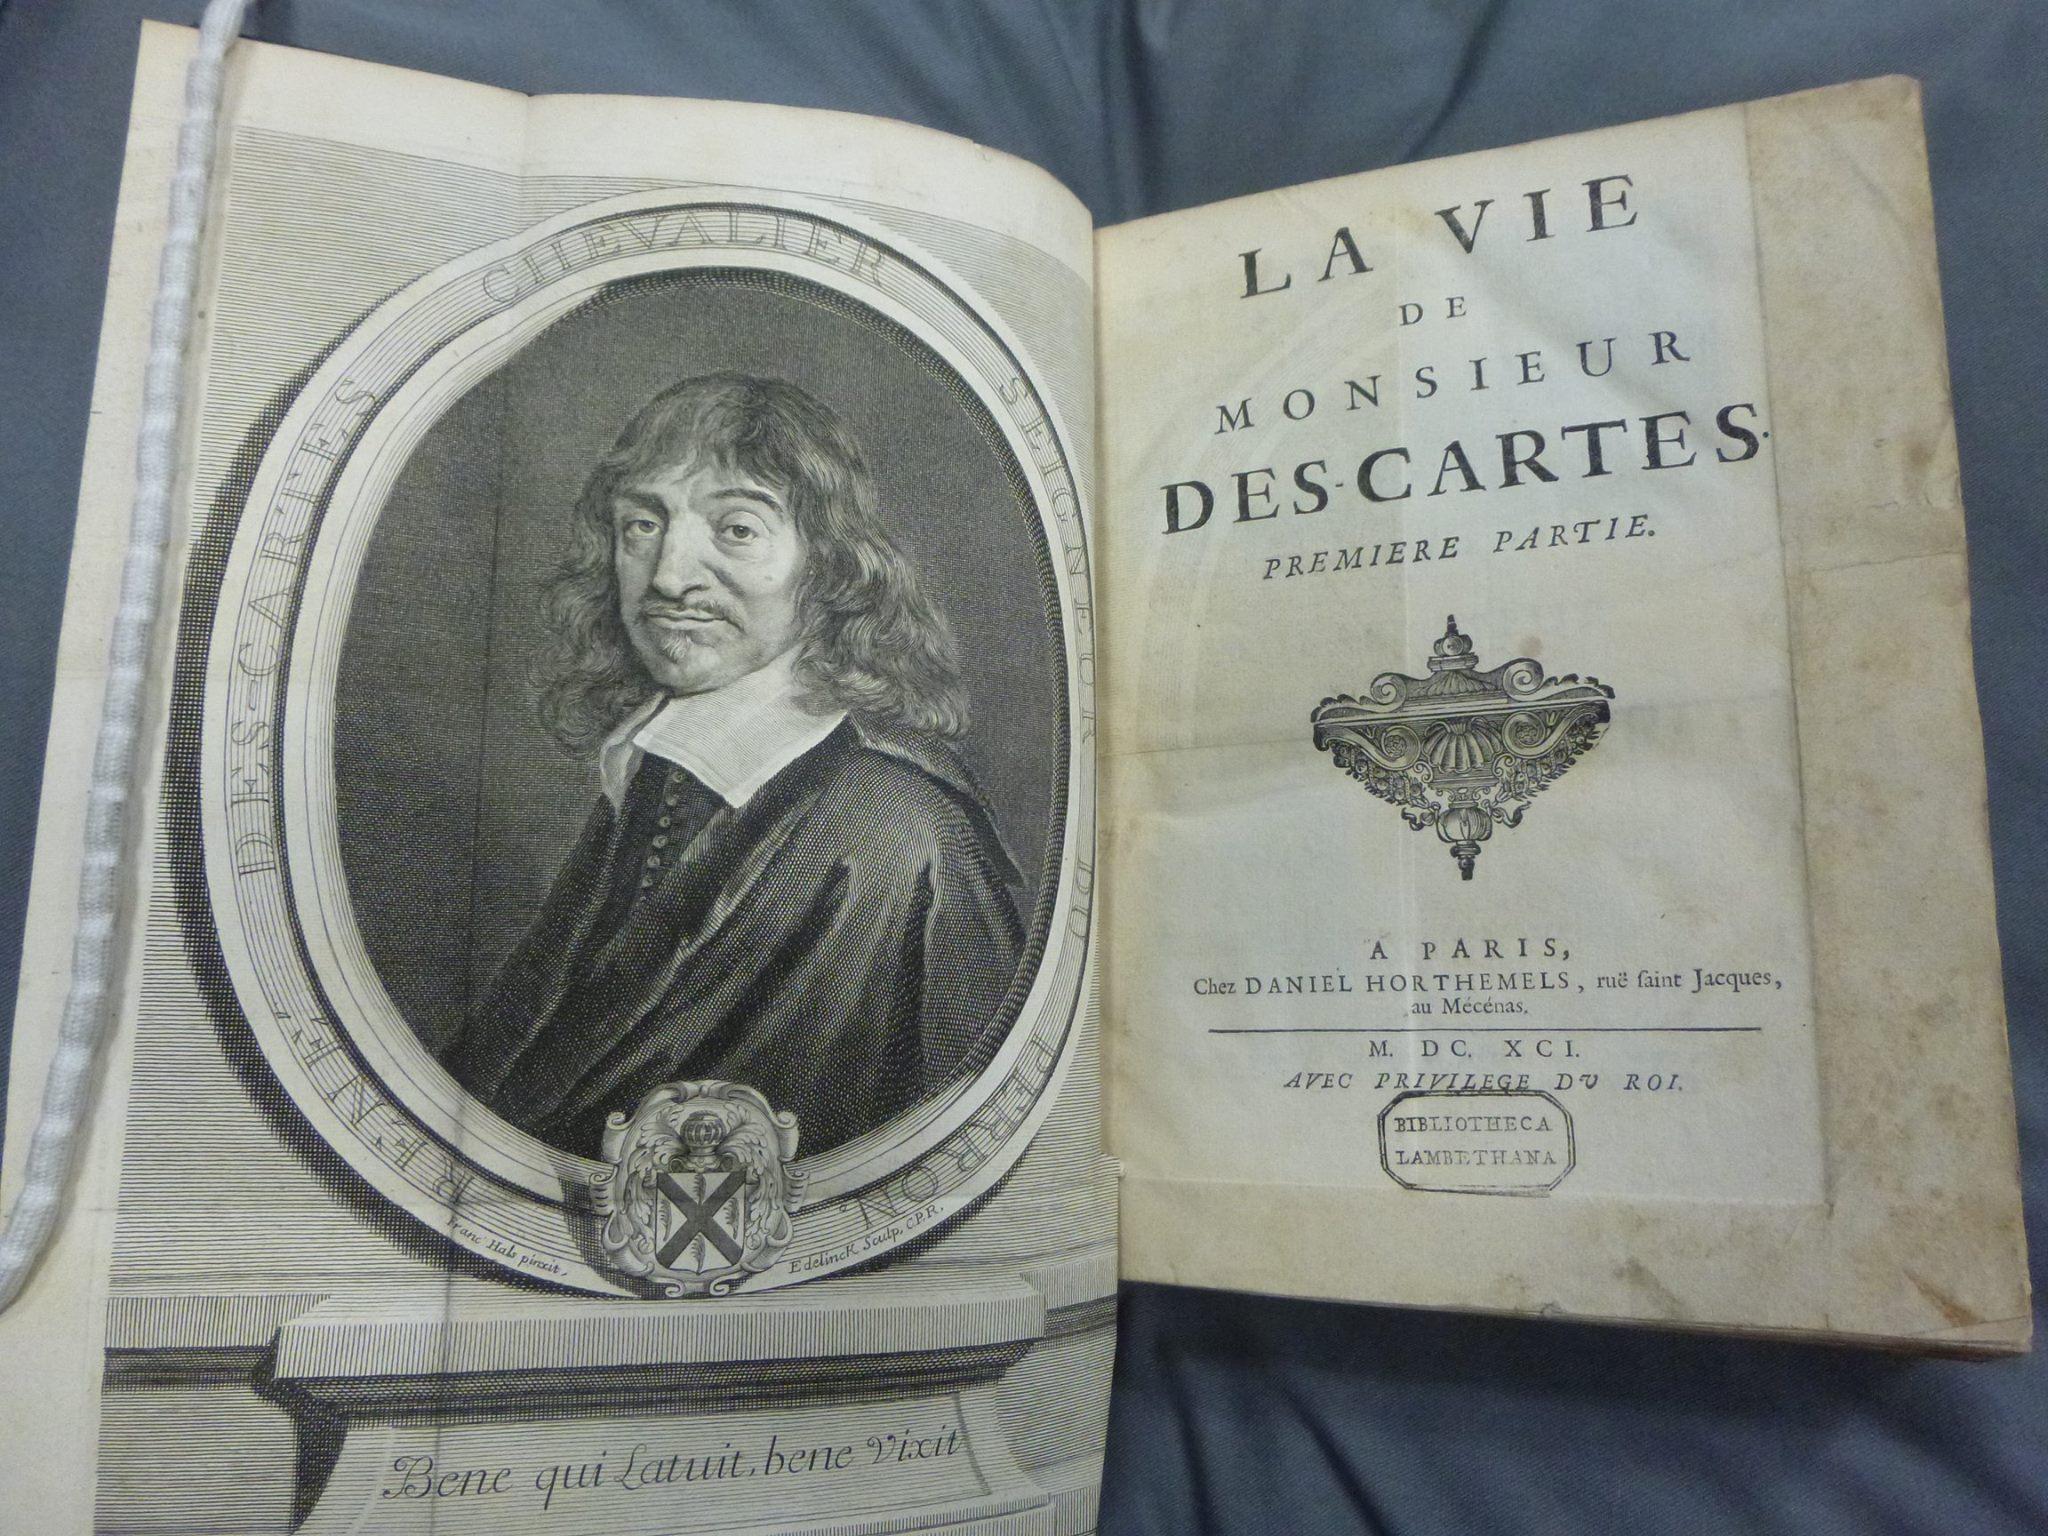 MottoRené Descartes dalam buku biografinyaLa vie de monsieur Descartes. Sumber gambar:Lambeth Palace Library